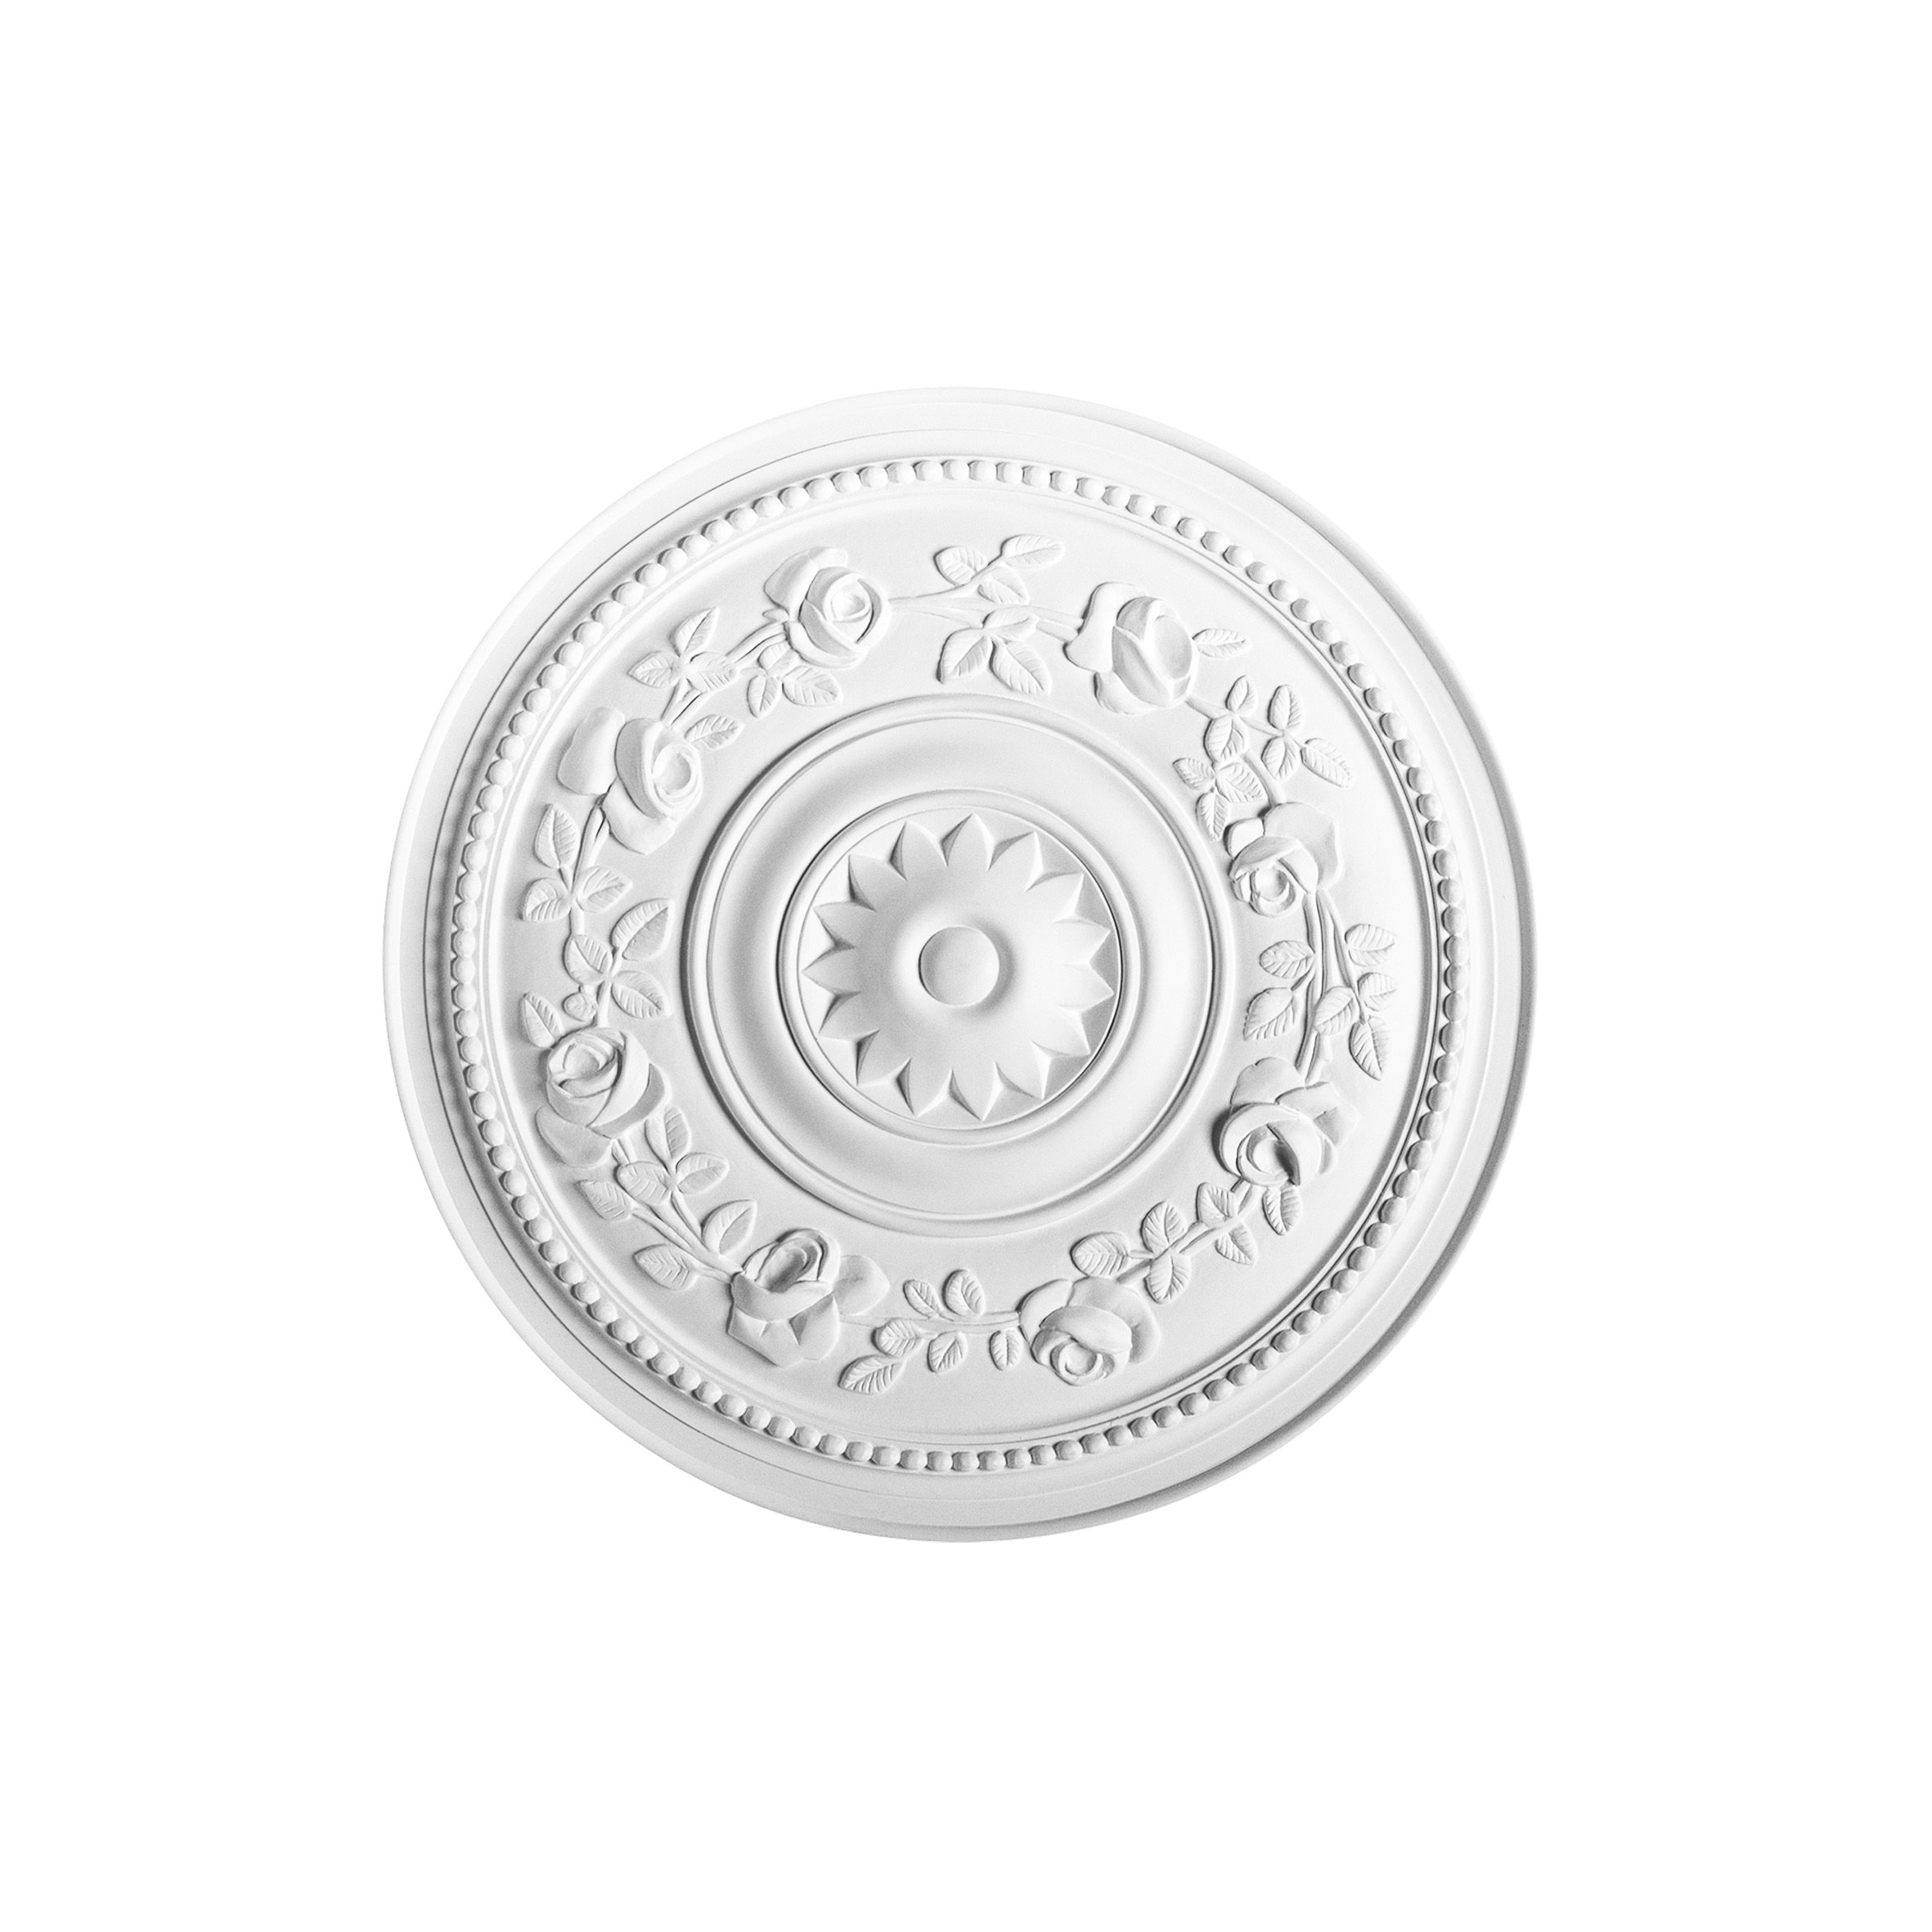 Orac Decor White Primed 16-inch Round Floral Ceiling Medallion ...